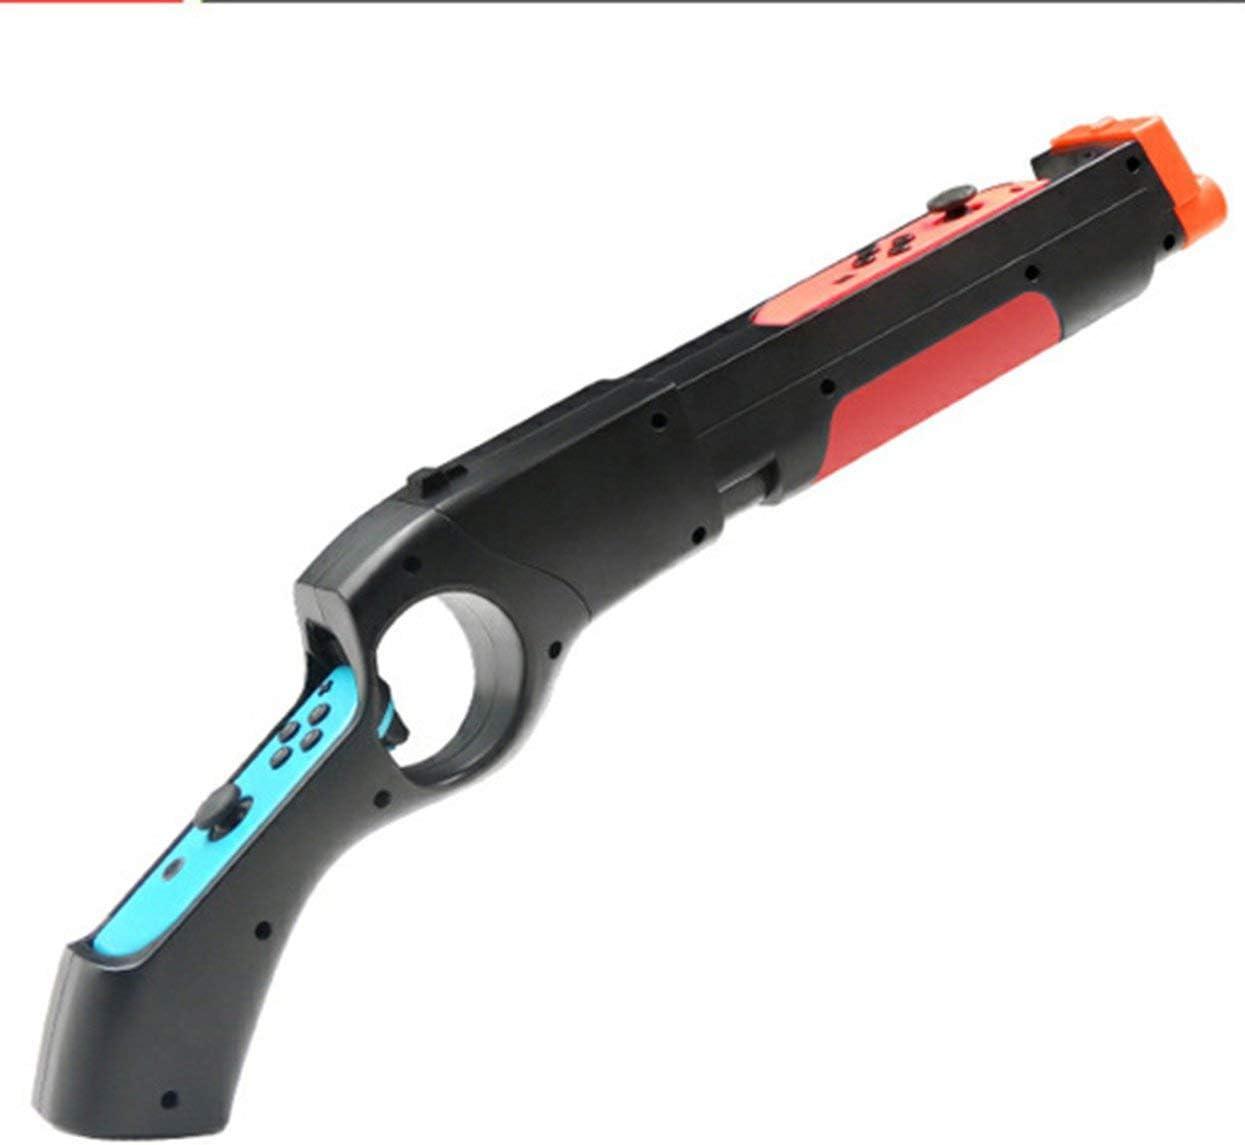 Tree-on-Life Game Gun Compatible con Nintendo Switch Wolfenstein 2 Nintendo Switch Wii Remote Nunchuck Shoot Sport Juegos